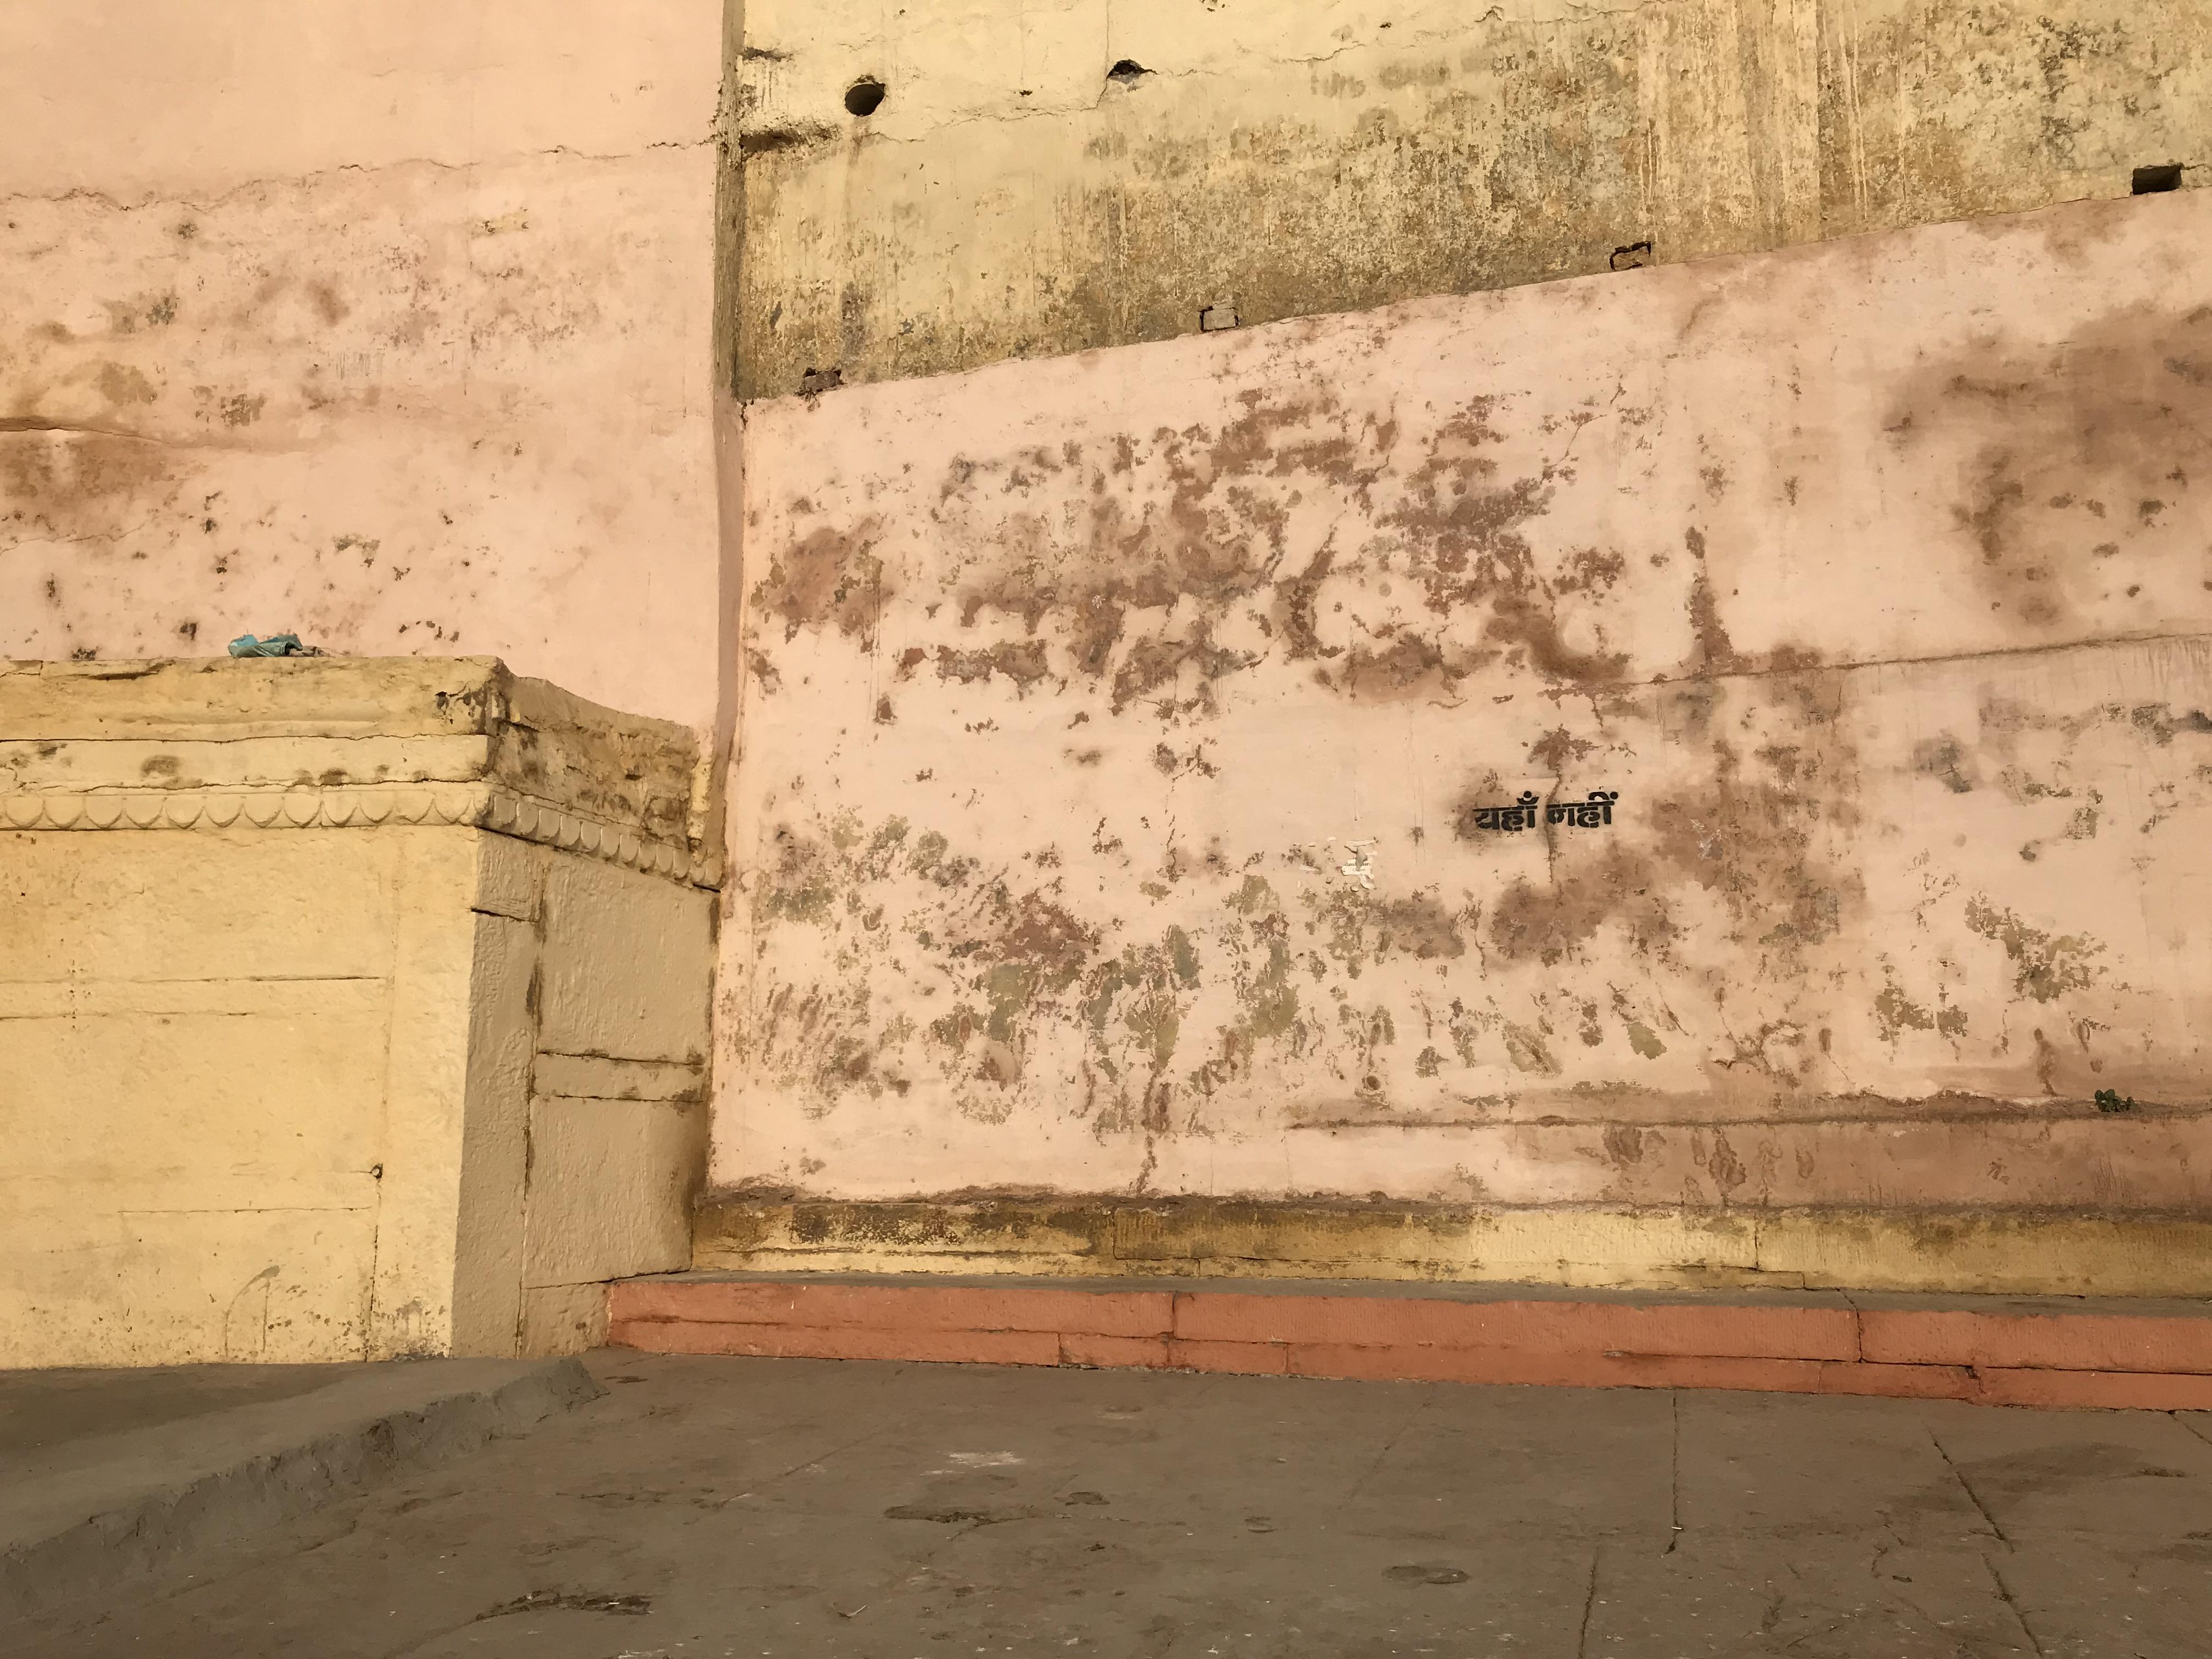 <i>यहाँ नहीं ( Not Here )</i> Stencil, paint on wall Varanasi, India 2018